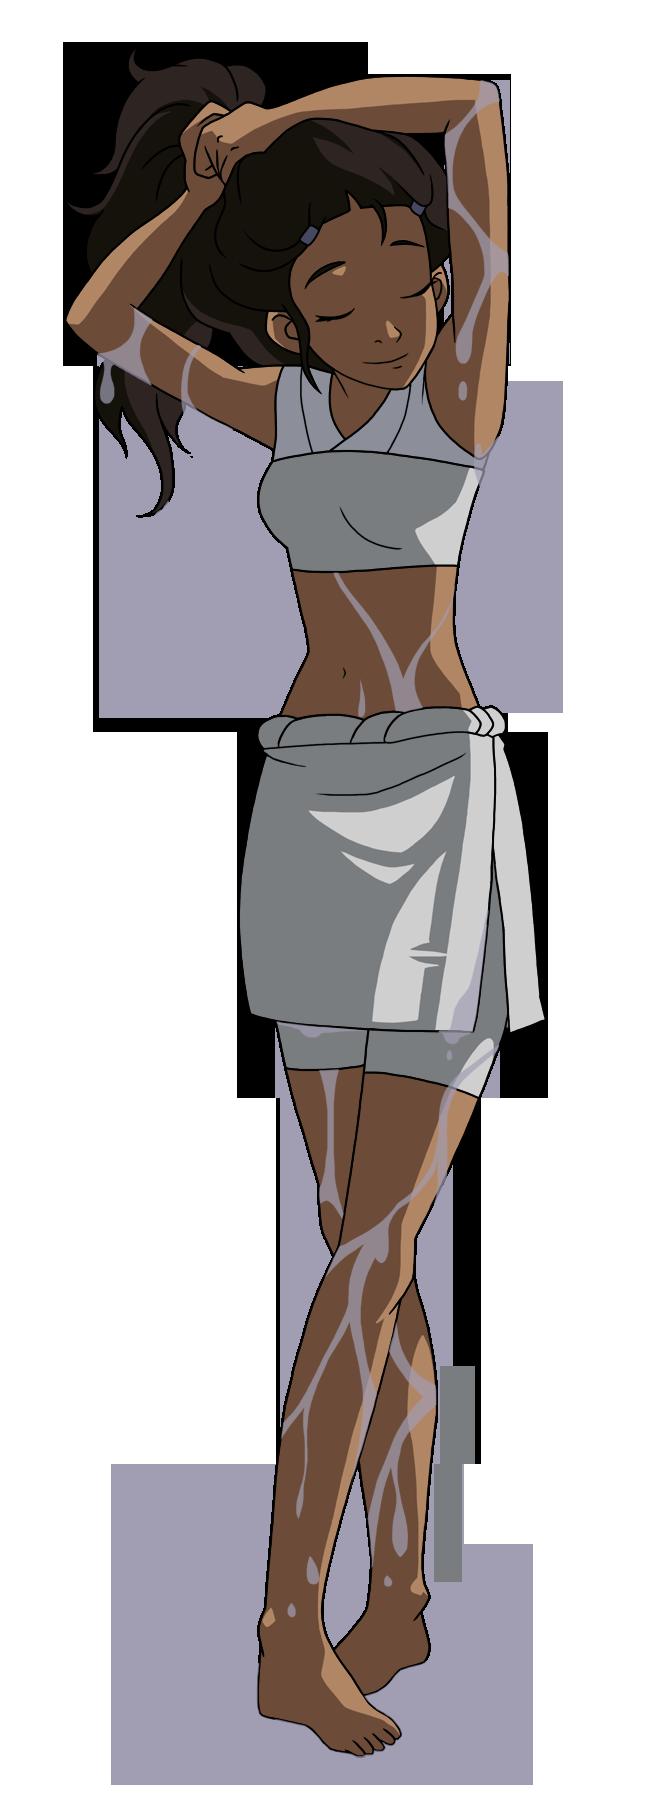 Pictures of katara wearing her bikini, carribben black mature women com